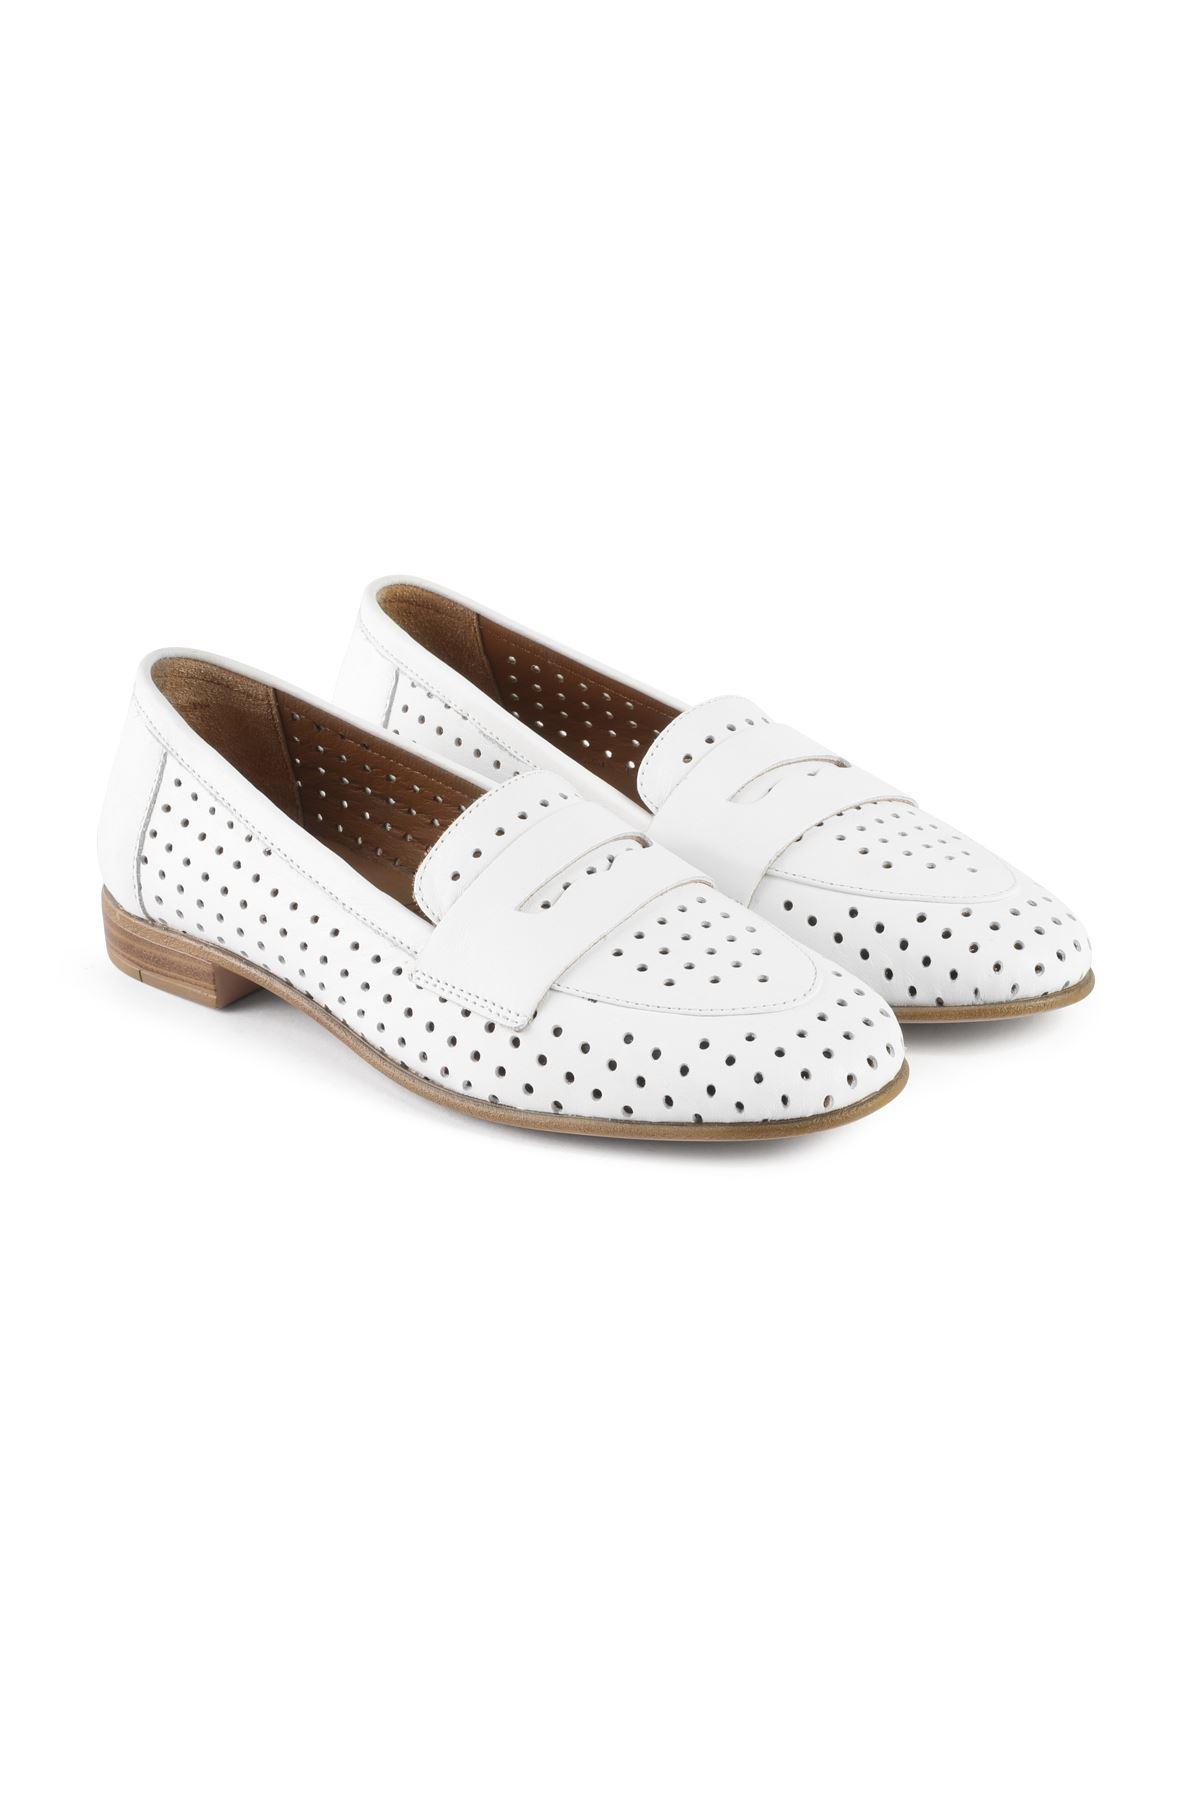 Libero MS2200 Beyaz Babet Ayakkabı